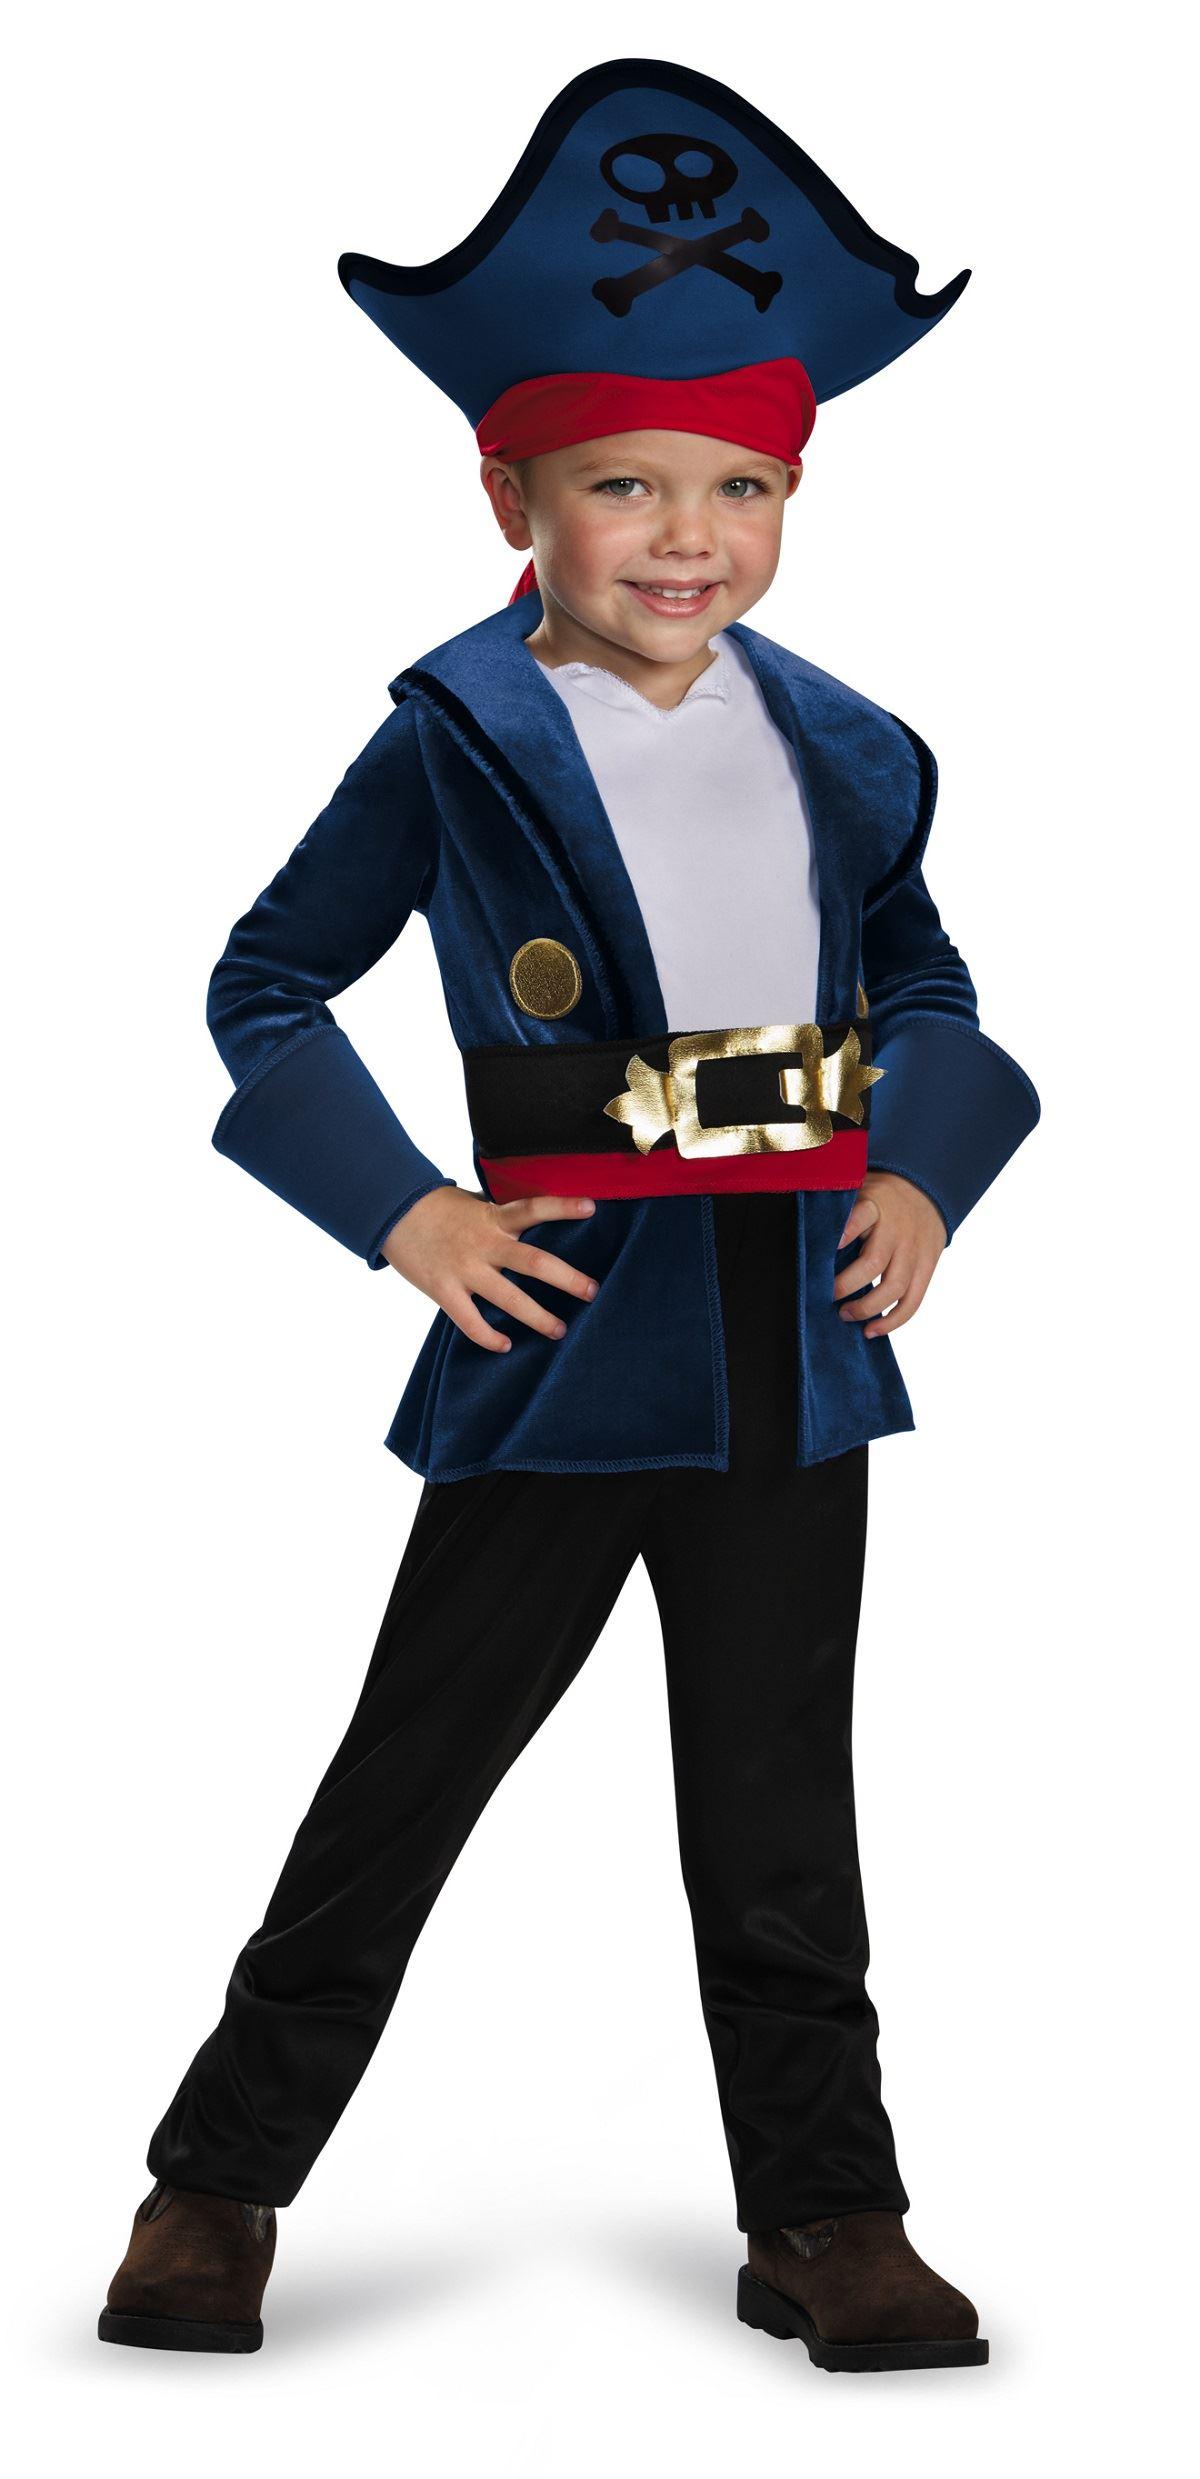 Kids Captain Jake Pirate Boys Costume | $23.99 | The Costume Land